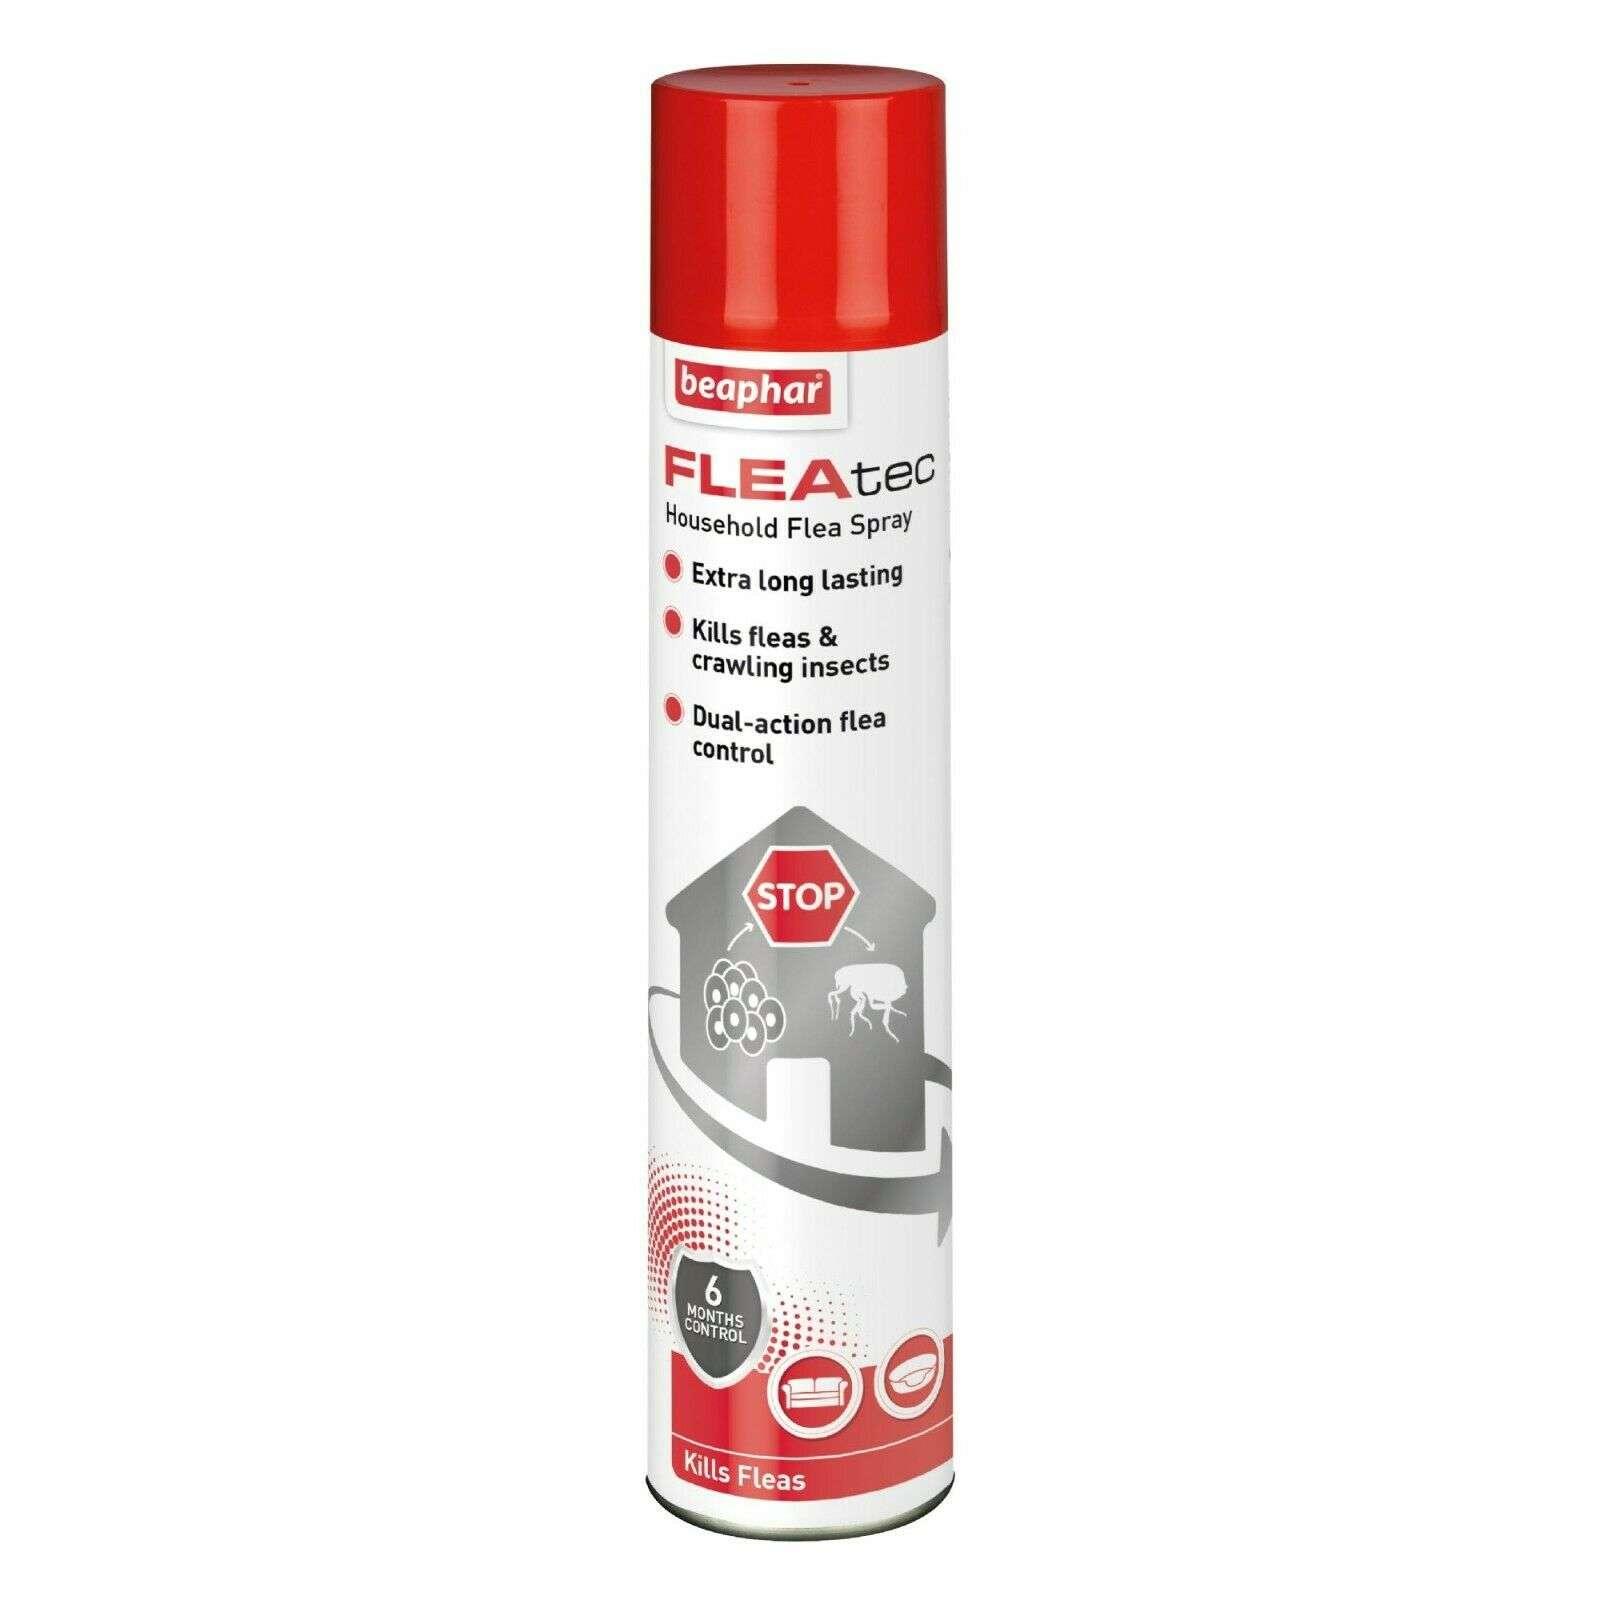 Beaphar FLEAtec House Spray 600ML. Premium Flea Control Spray with IGR